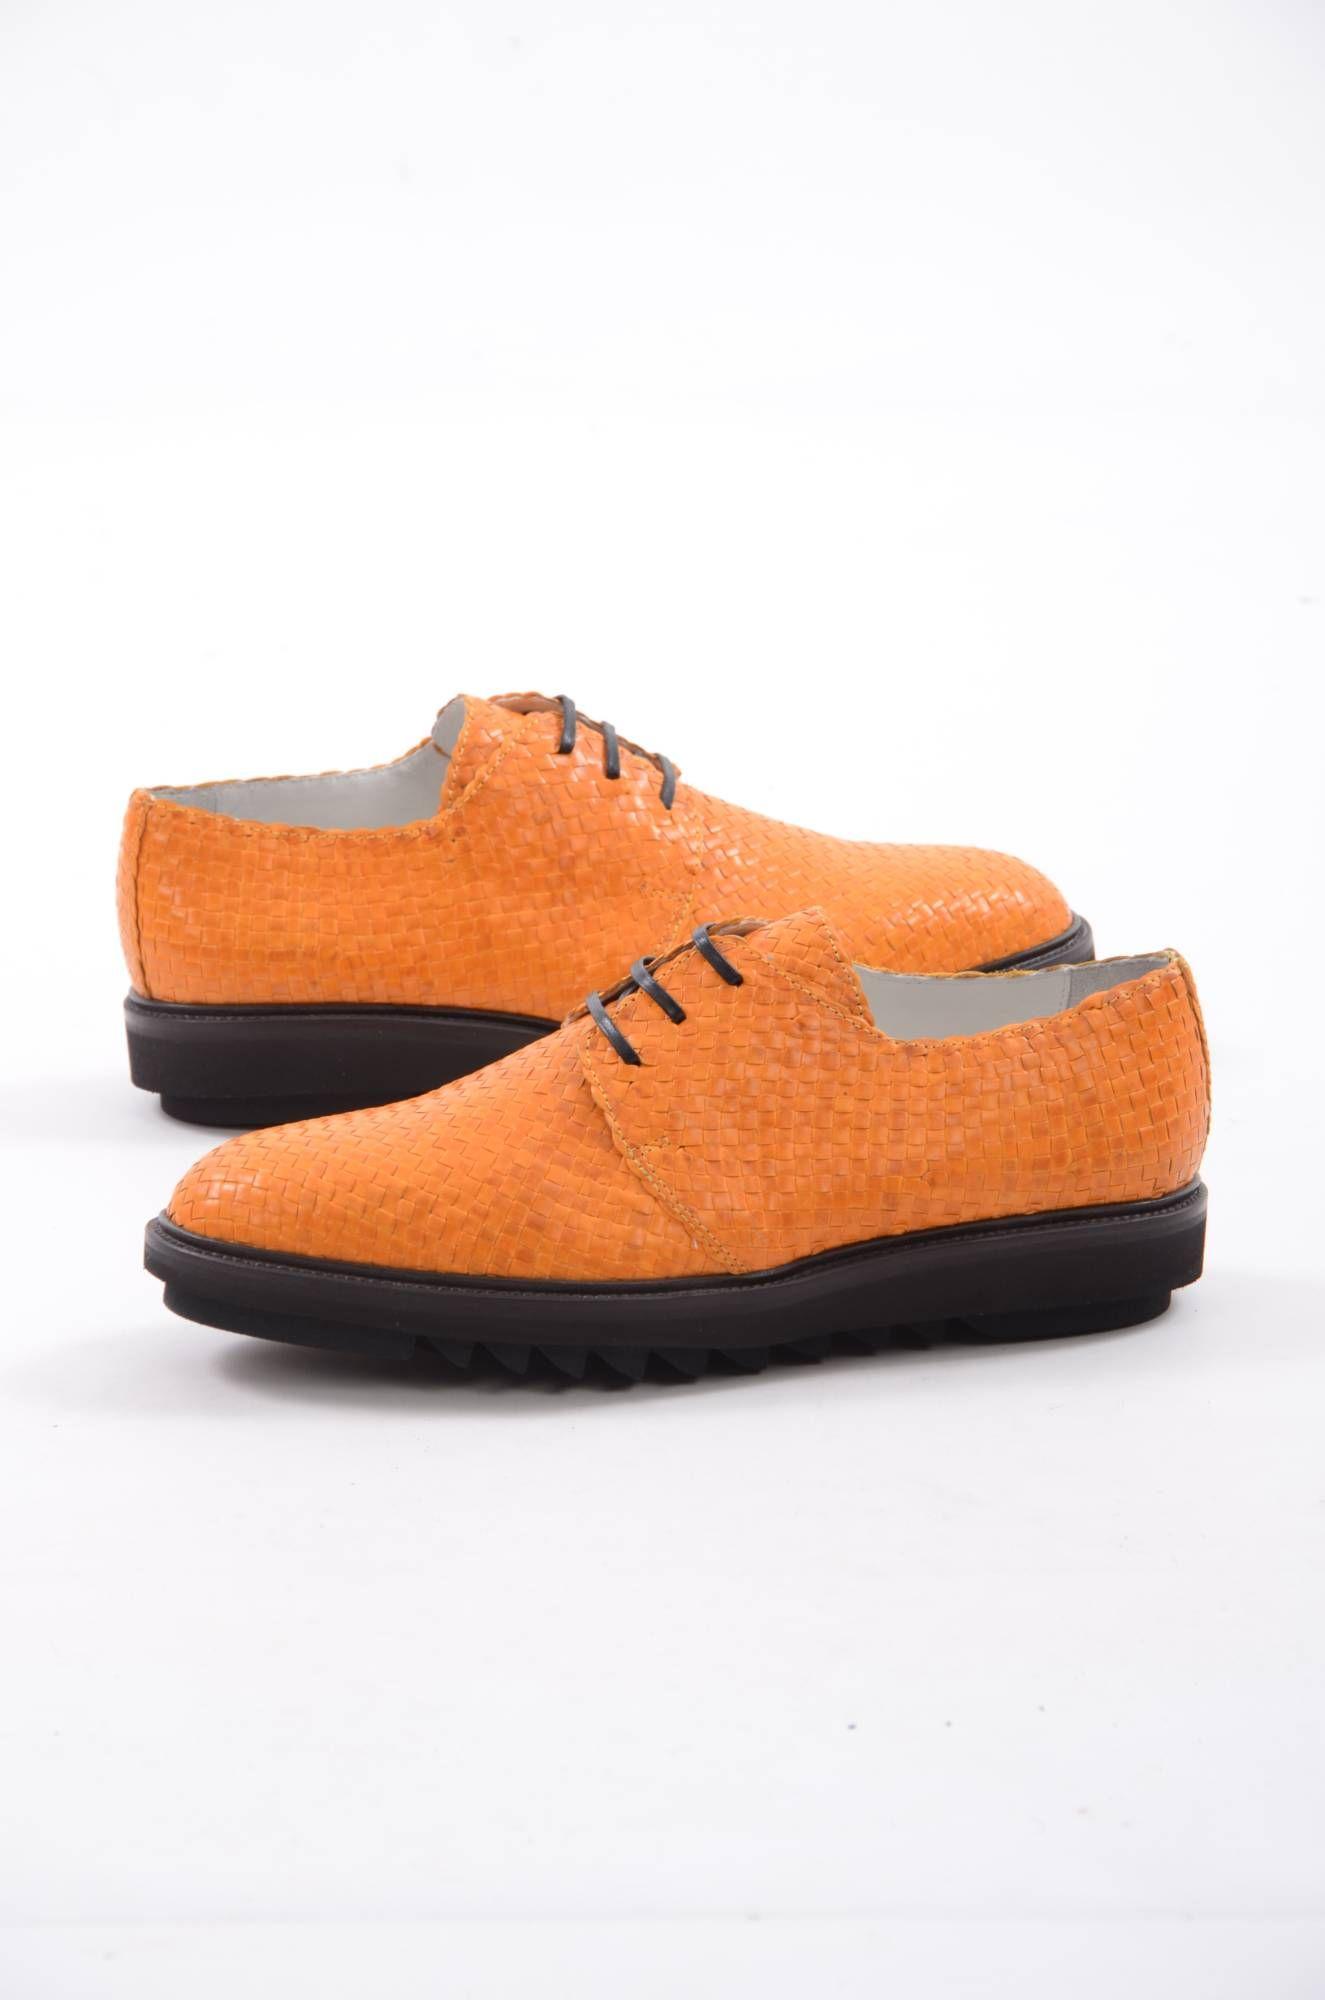 Dolce & Gabbana Men Derby Shoes